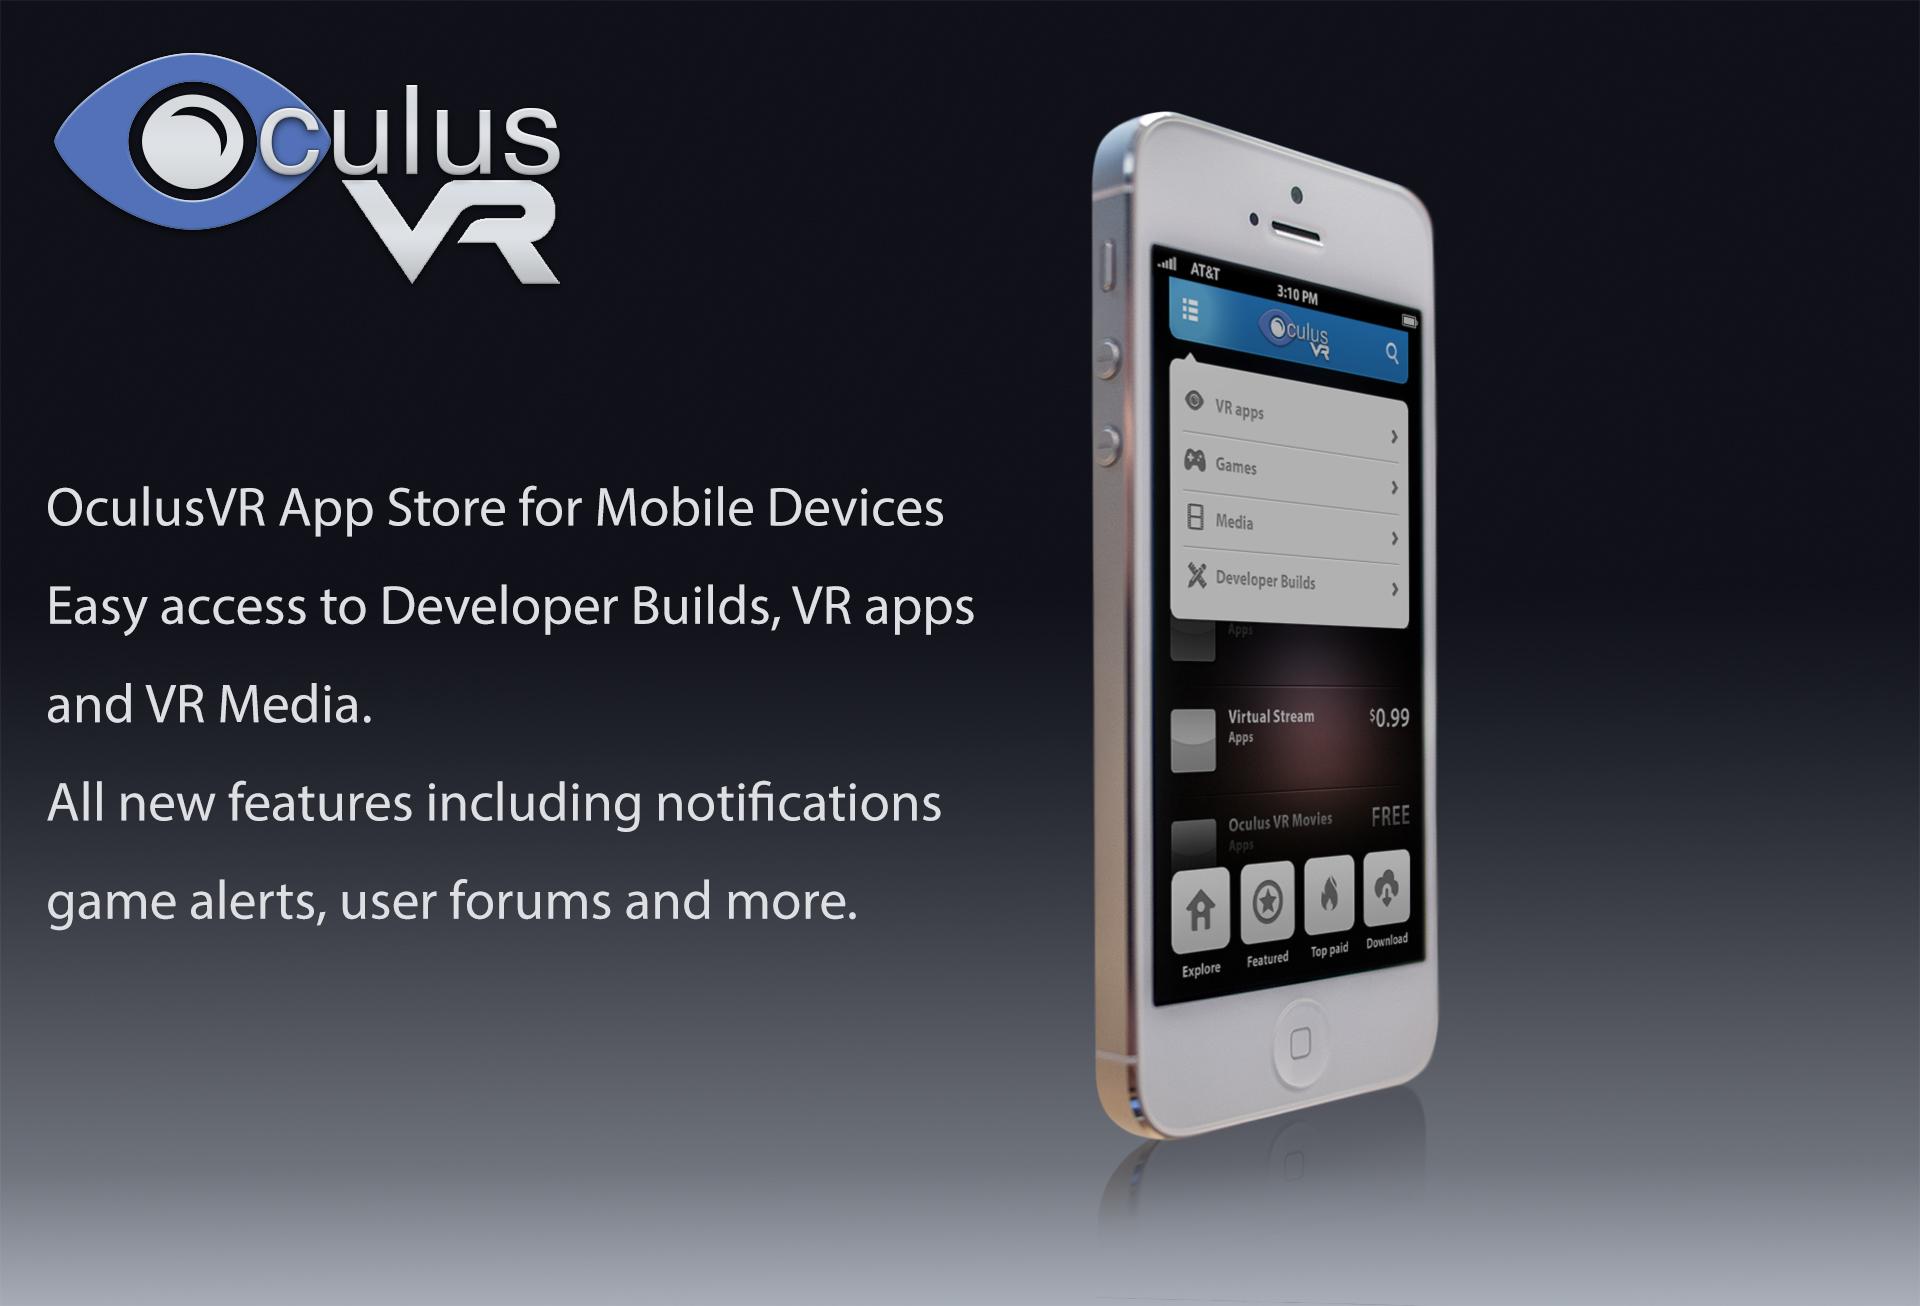 iphone_OculusVR_Store_mockupV2.jpg